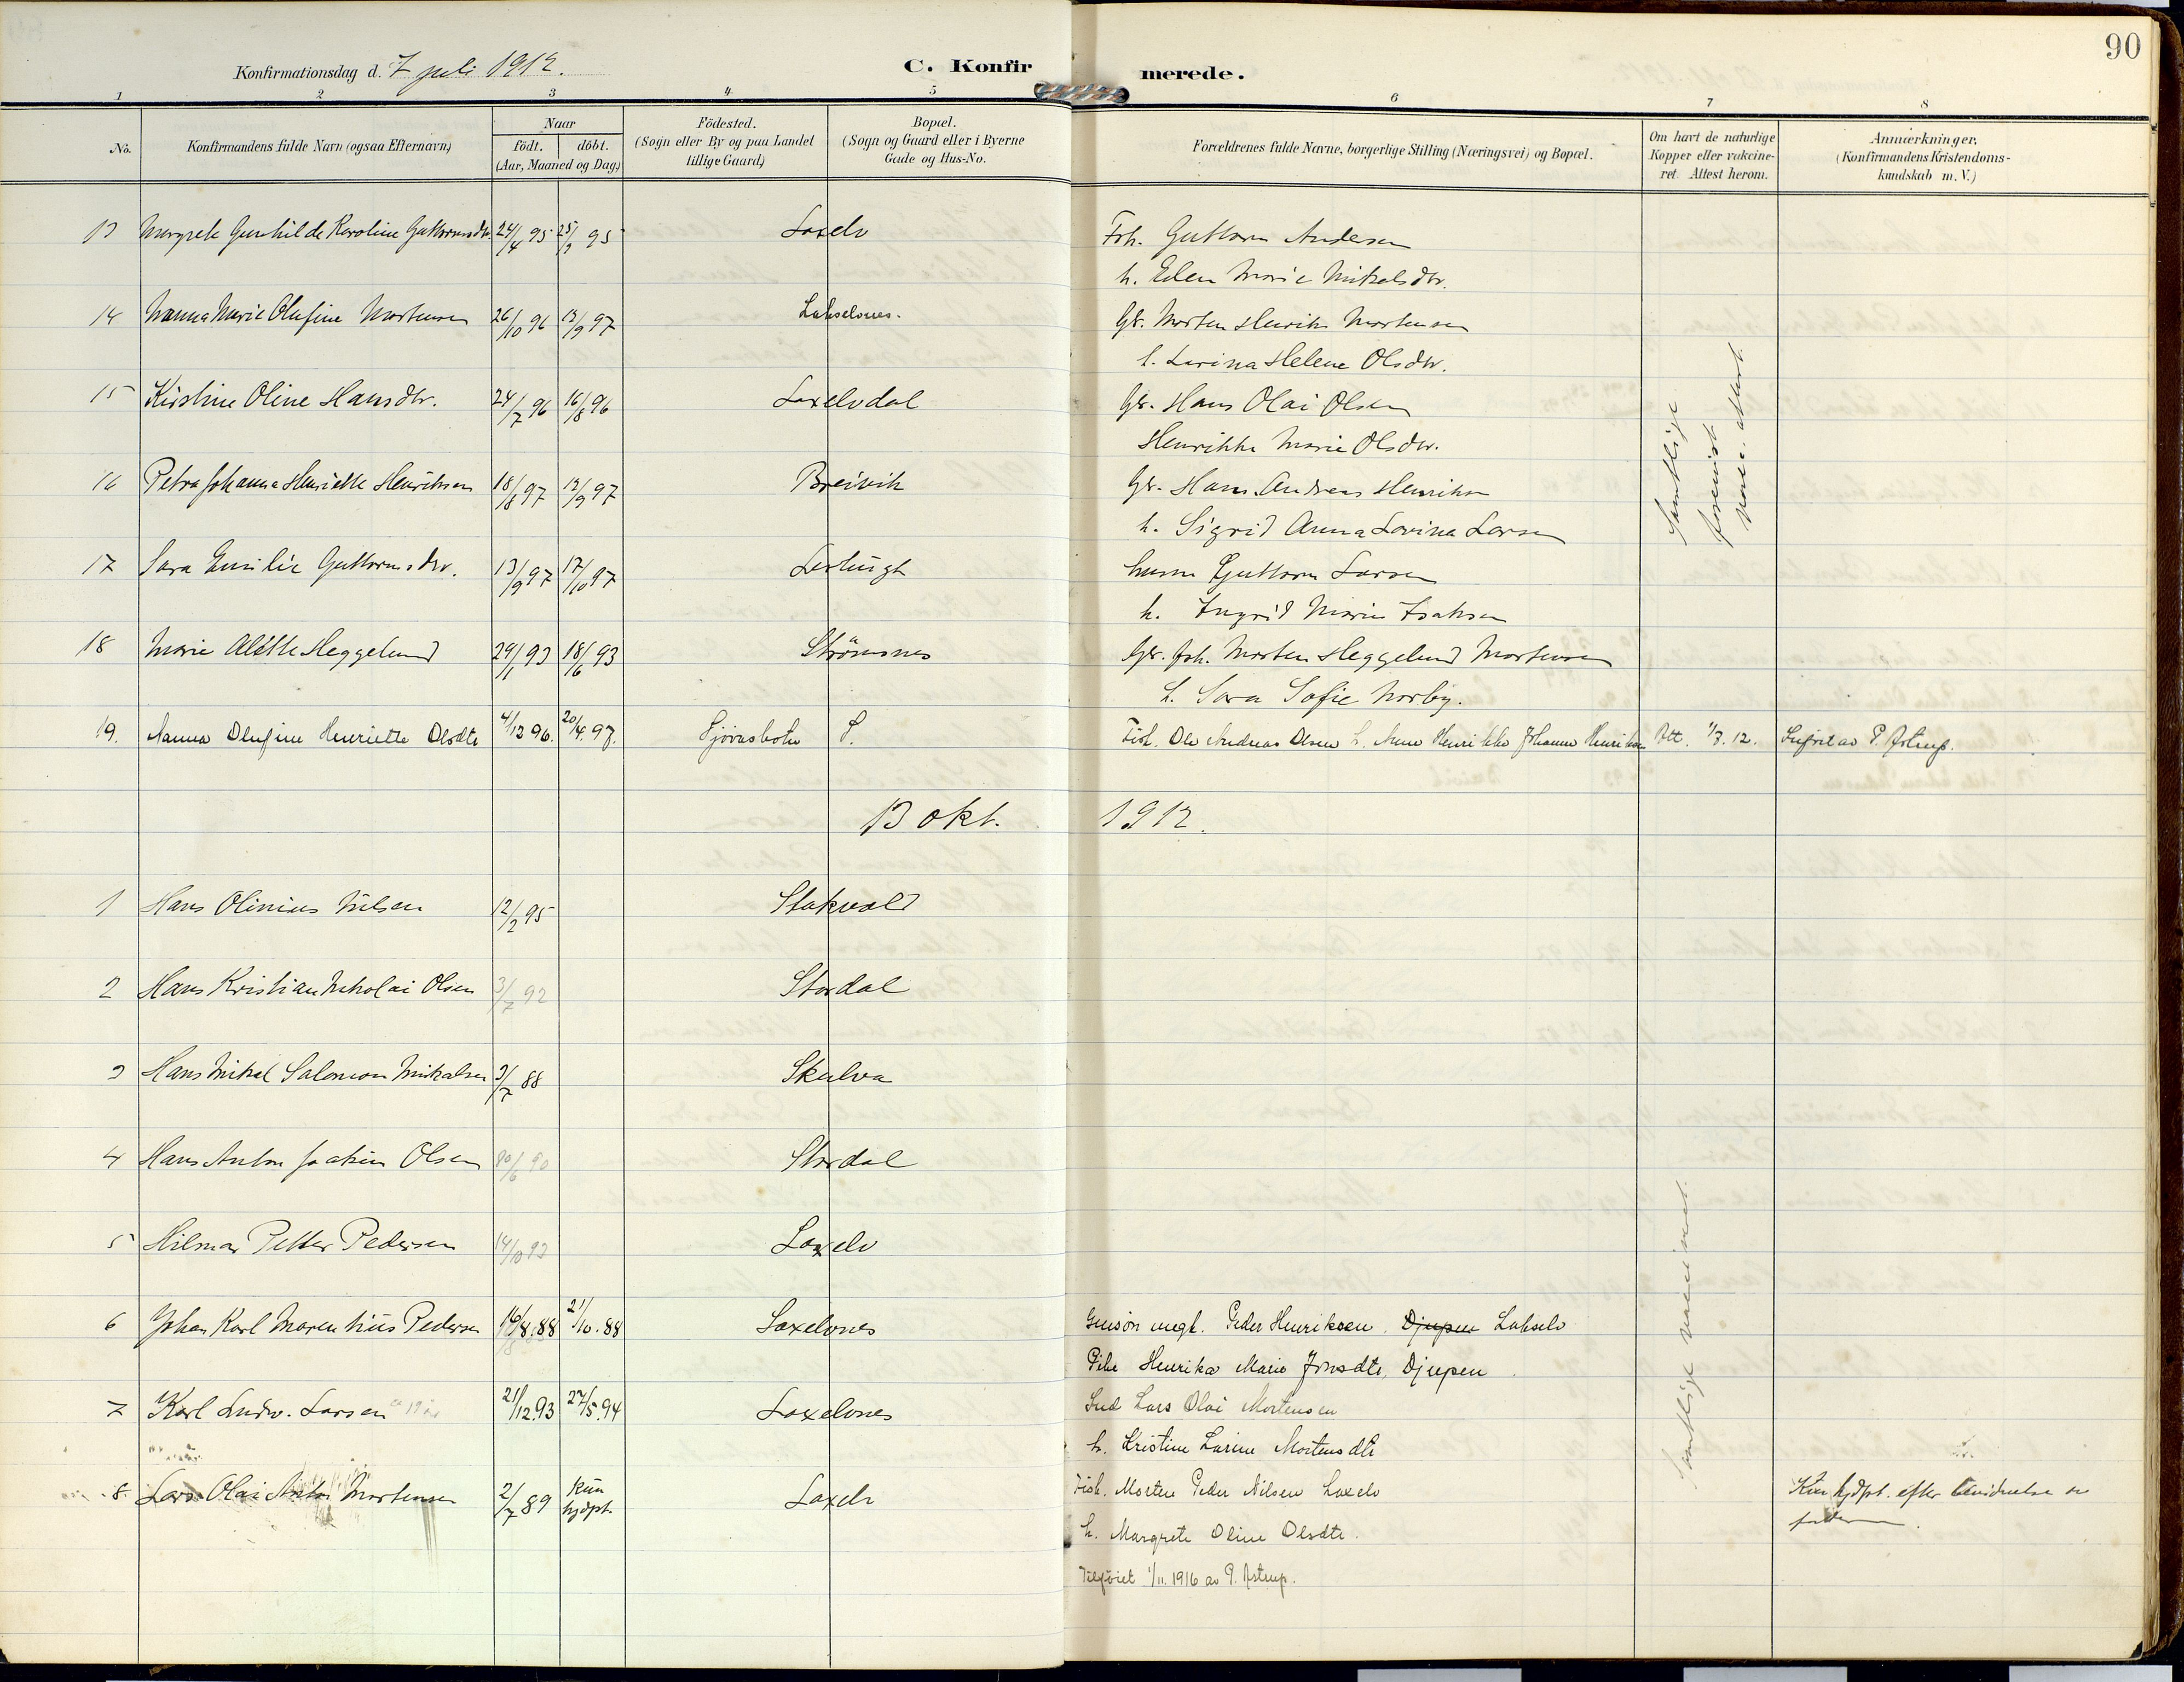 SATØ, Lyngen sokneprestembete, Ministerialbok nr. 14, 1905-1920, s. 90